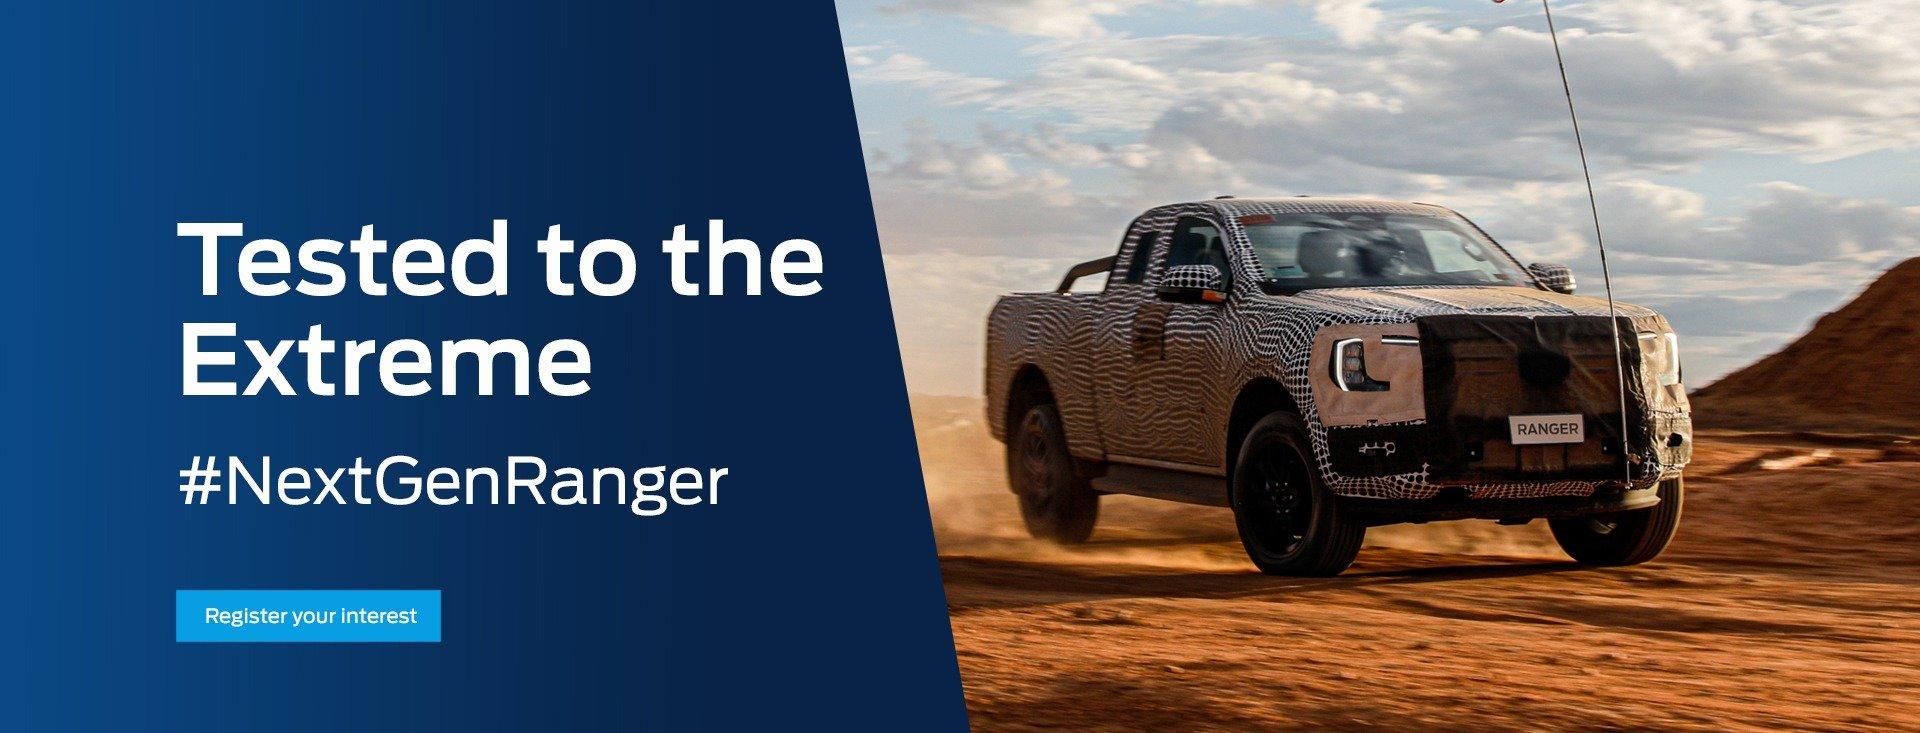 Jarvis-Ford-Next-Gen-Ranger